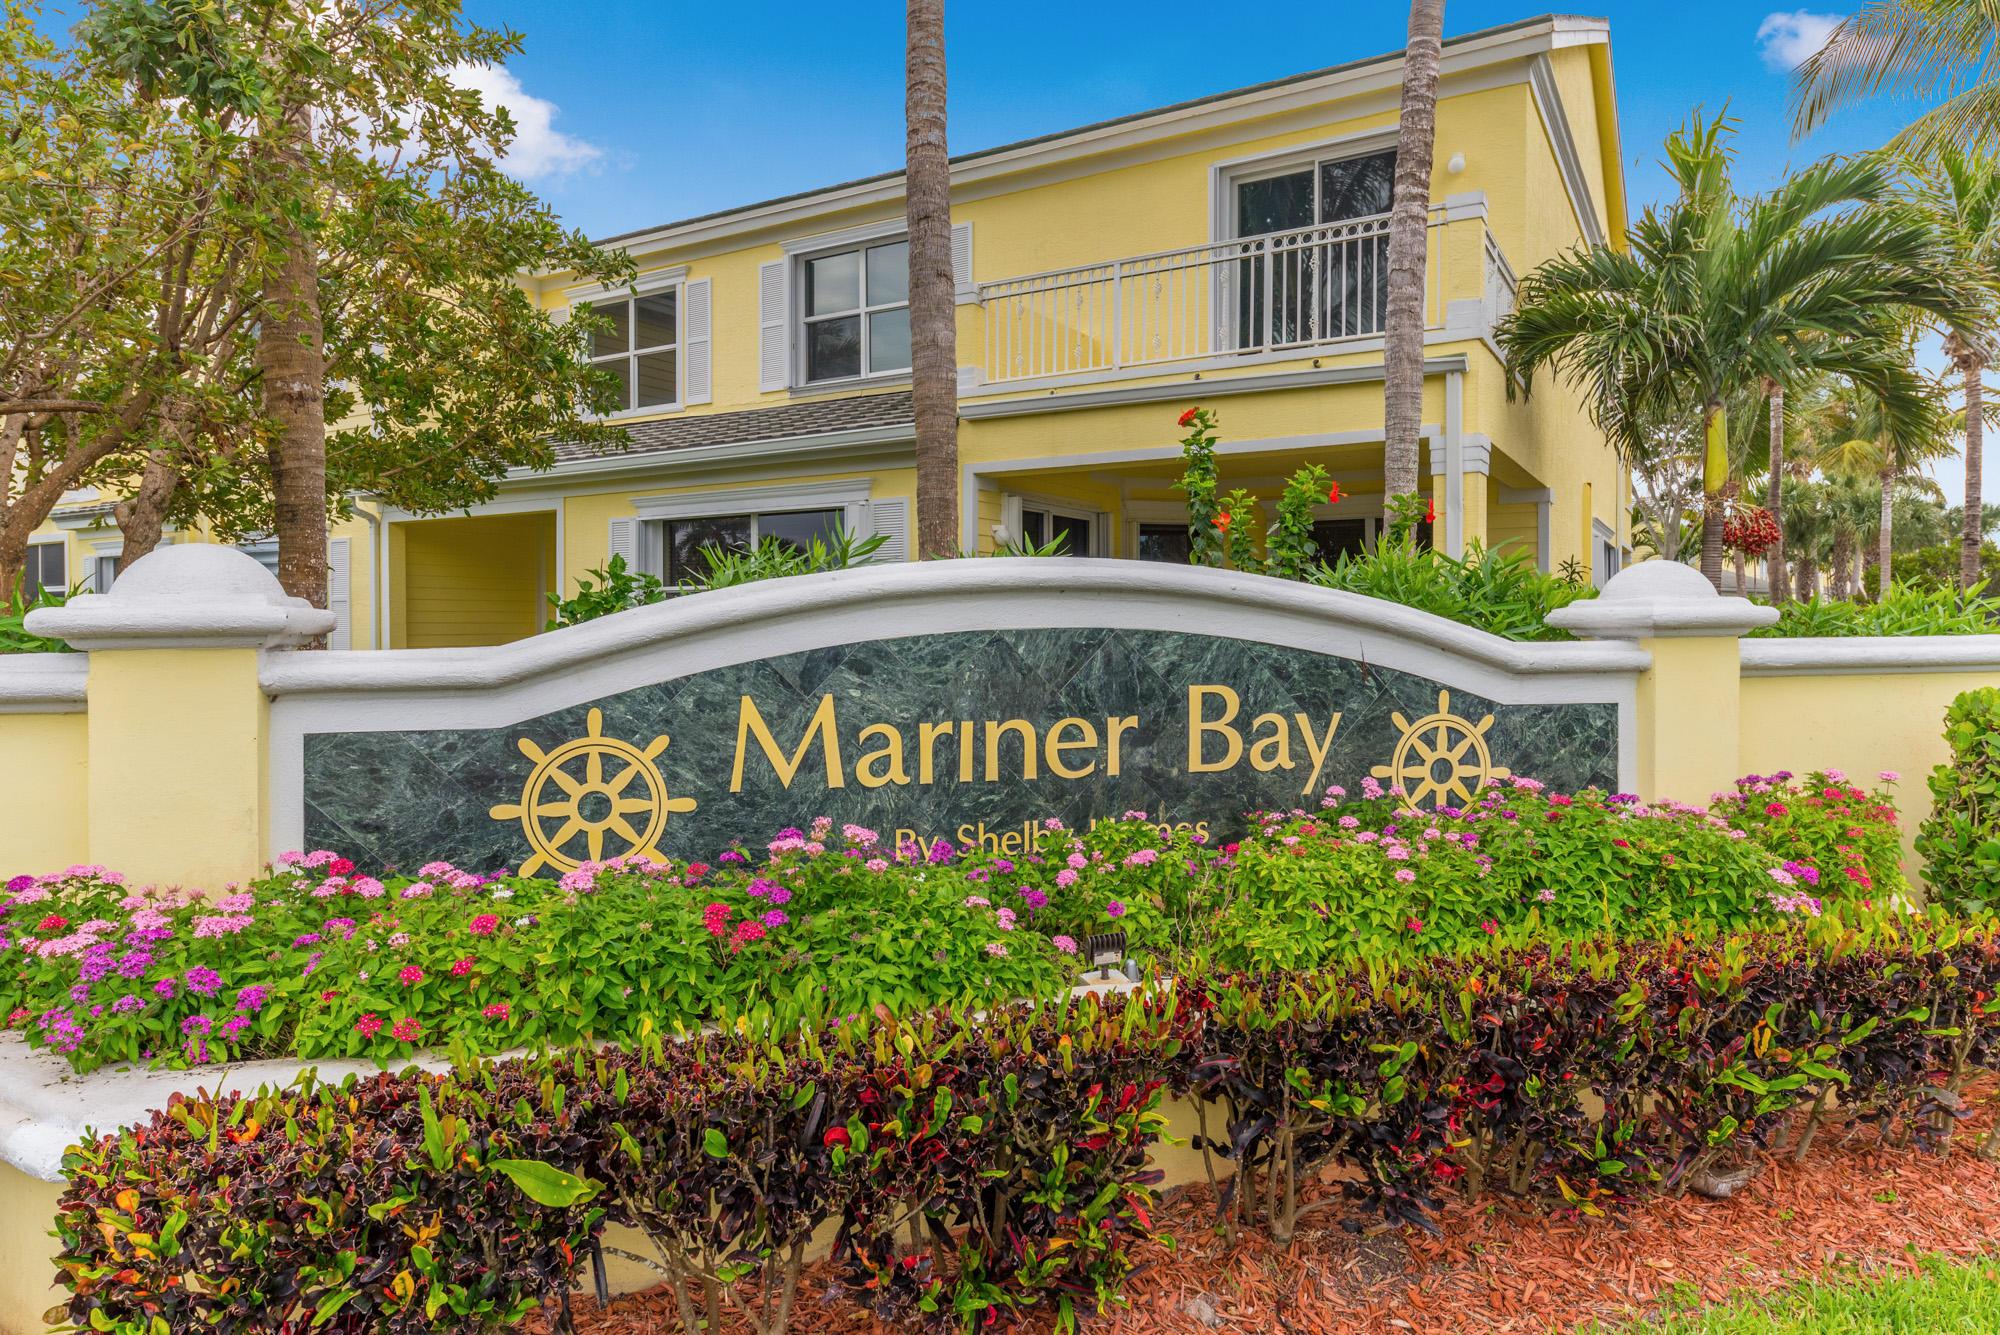 Mariner Bay Fort Pierce 34949